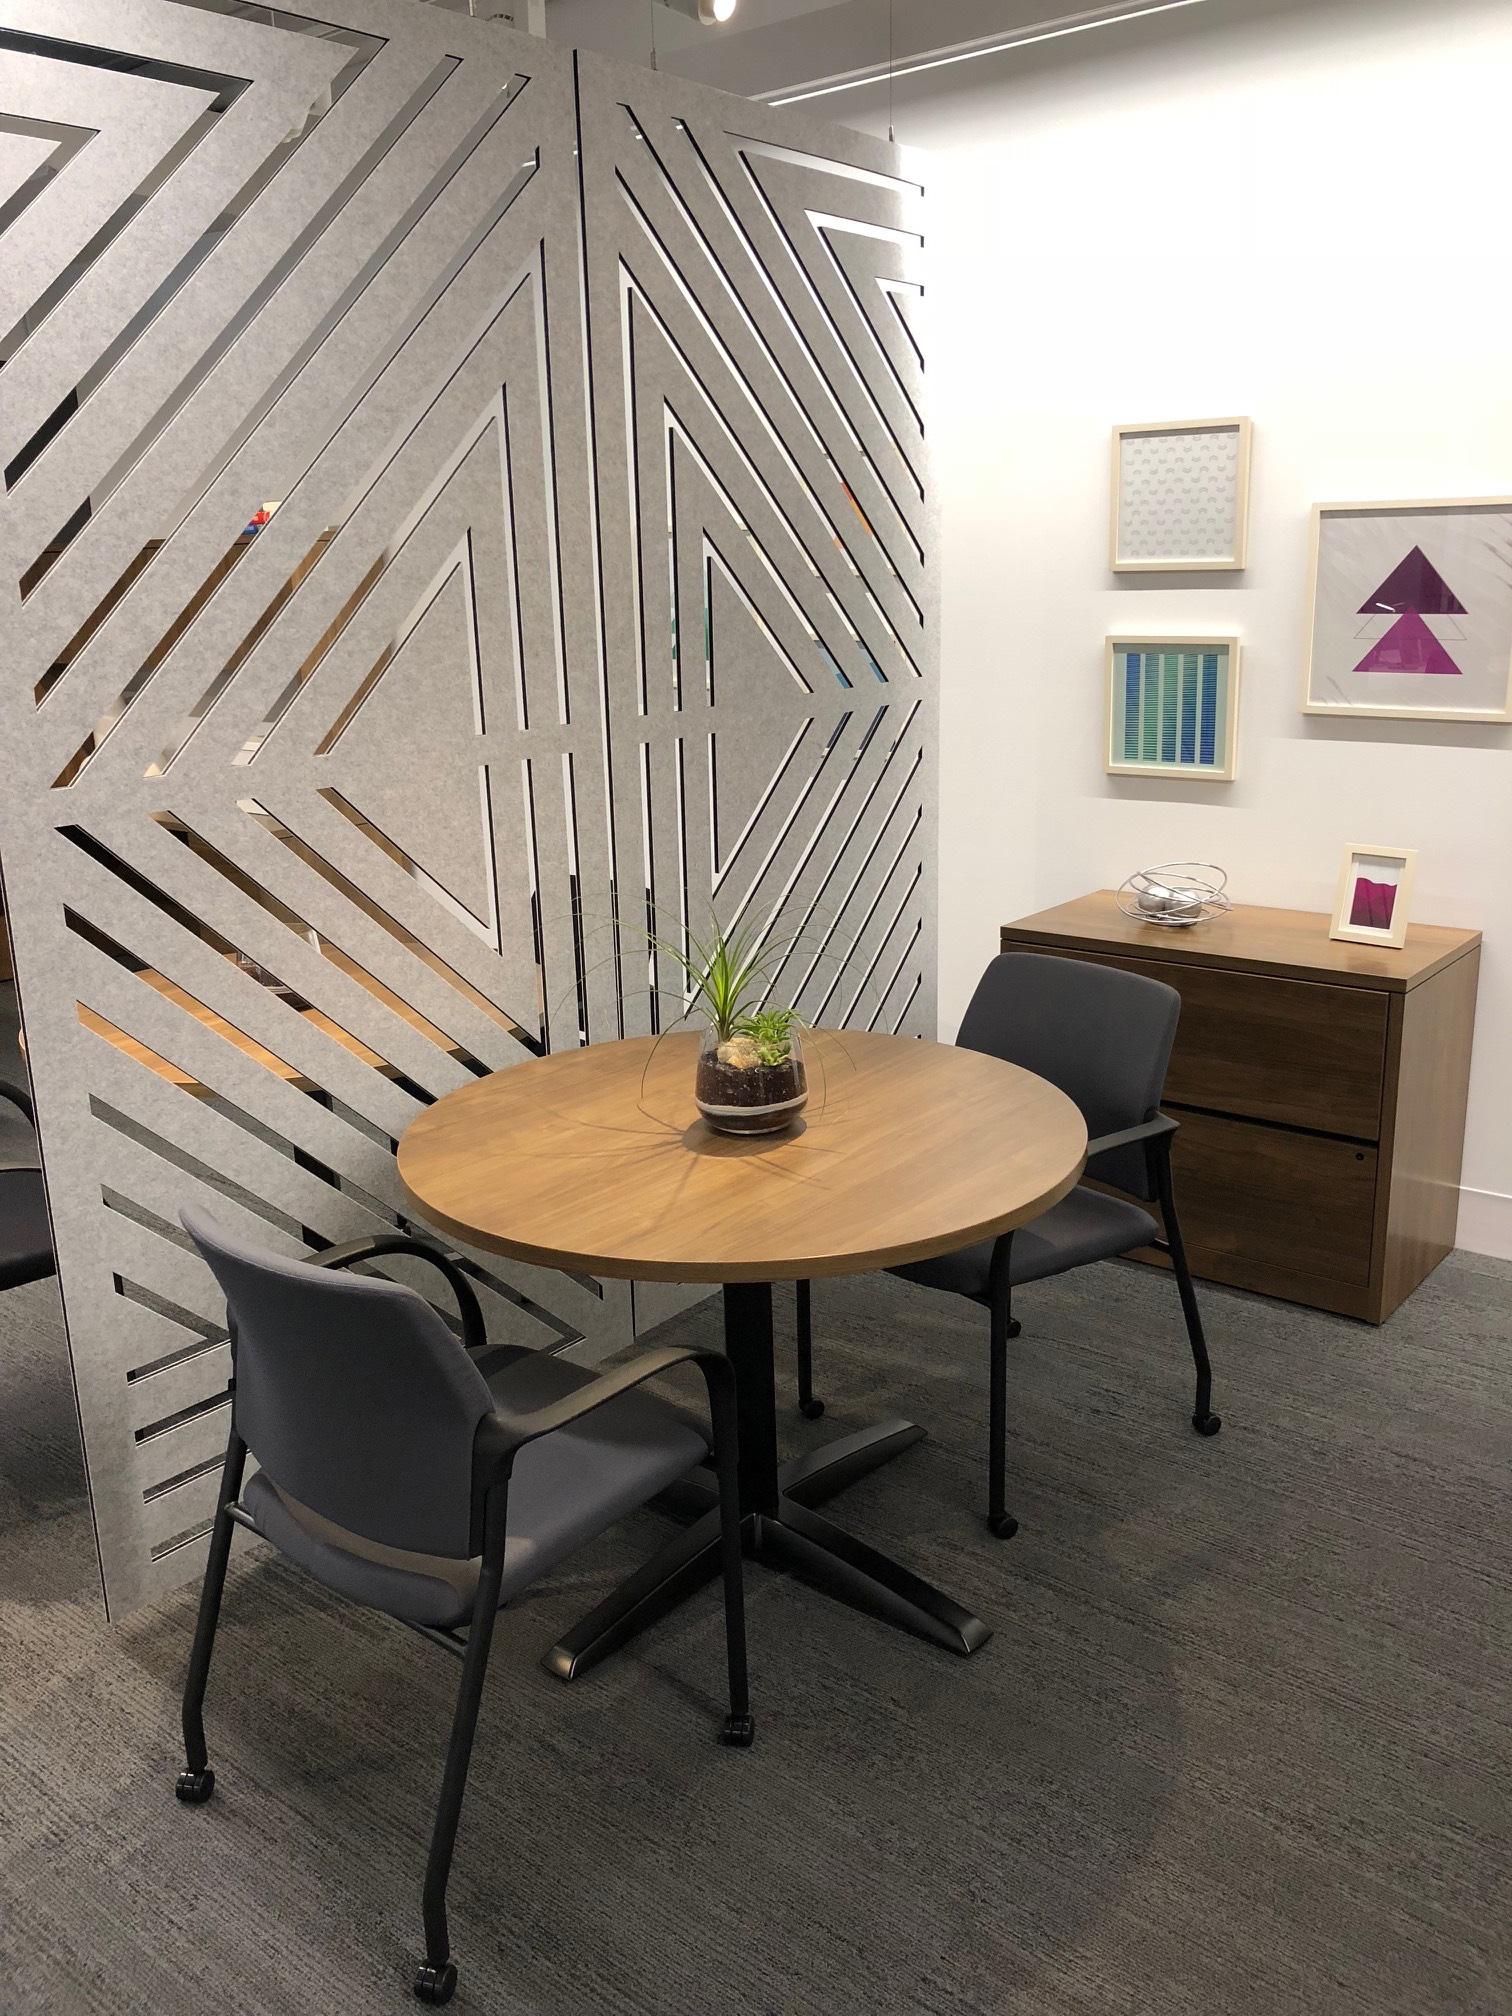 furniture-office-supplies-in-lakeland-florida-3-1.jpg